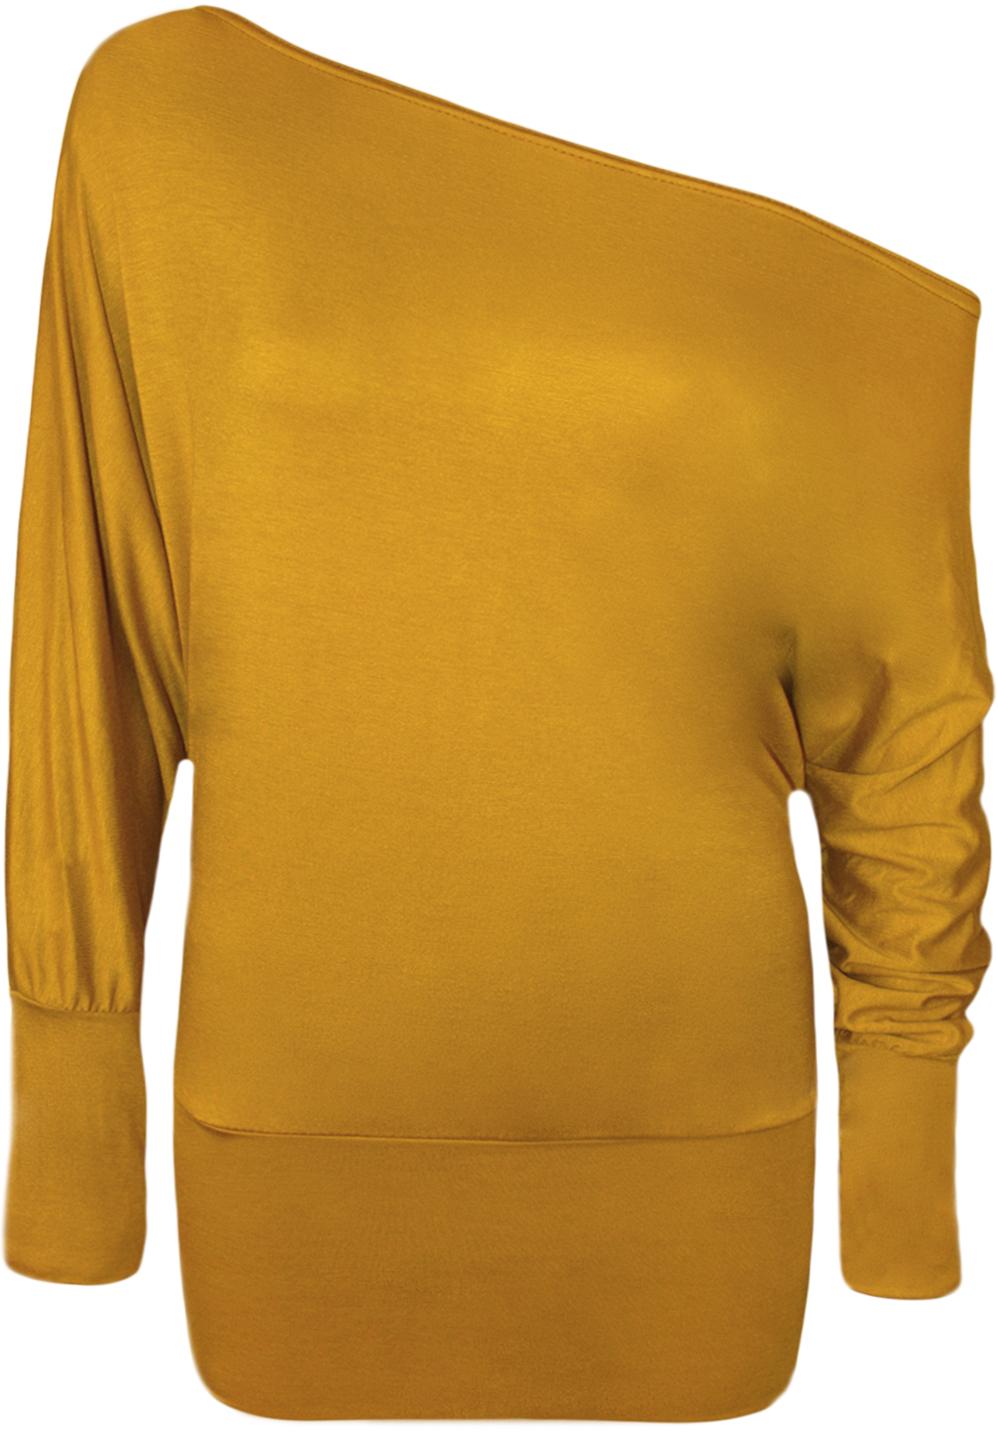 Damen-Tunika-Top-Einschultrig-Fledermaus-Langaermel-Einfarbig-T-shirt-36-48-Neu